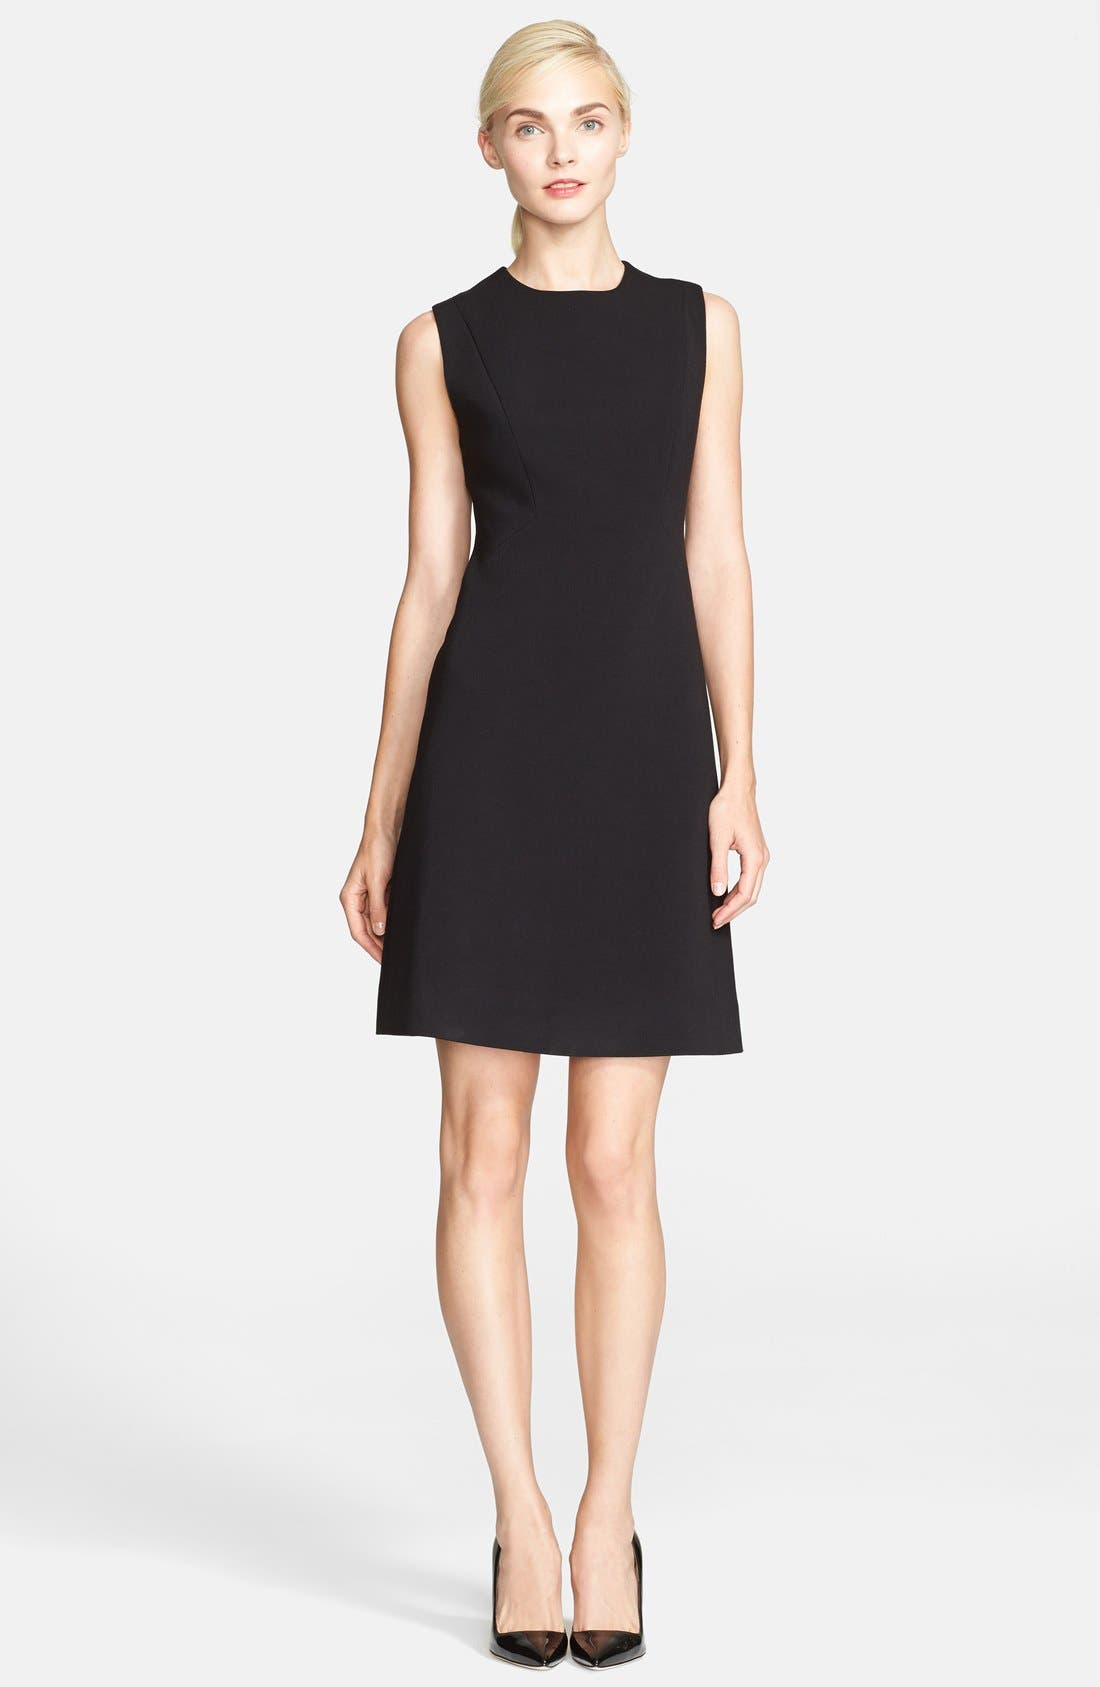 Sale alerts for kate spade new york 'sicily' sheath dress - Covvet